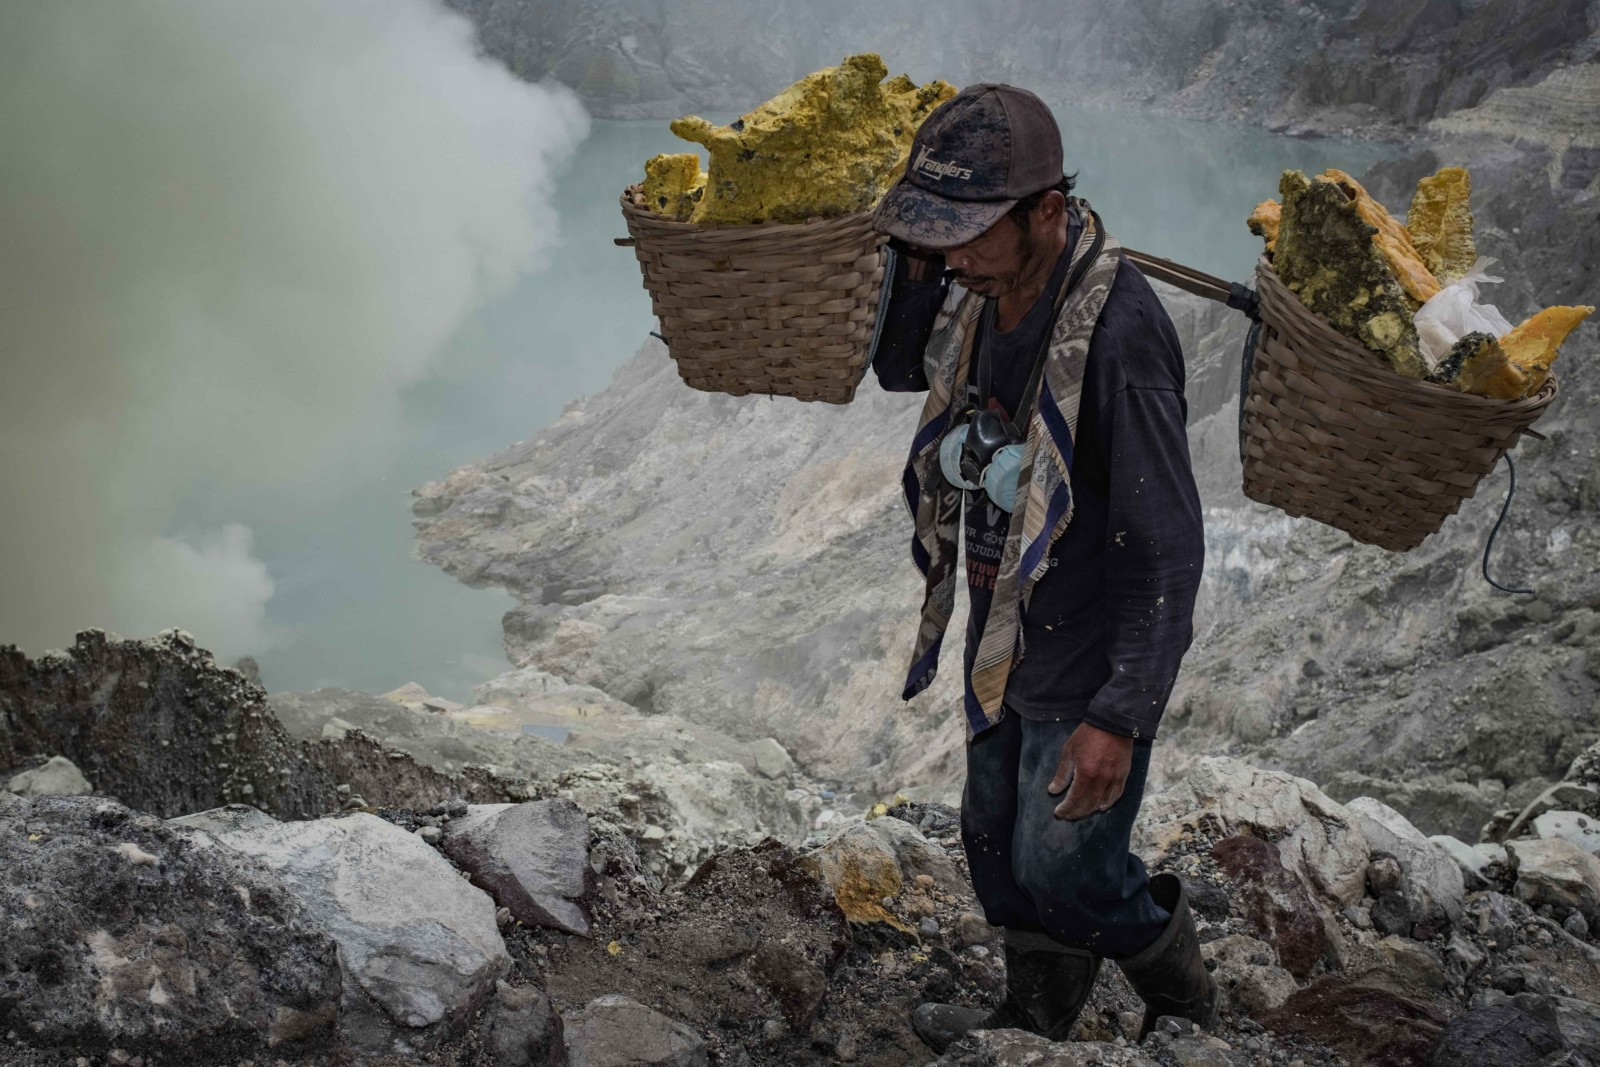 Photojournalist Mount Ijen Miner